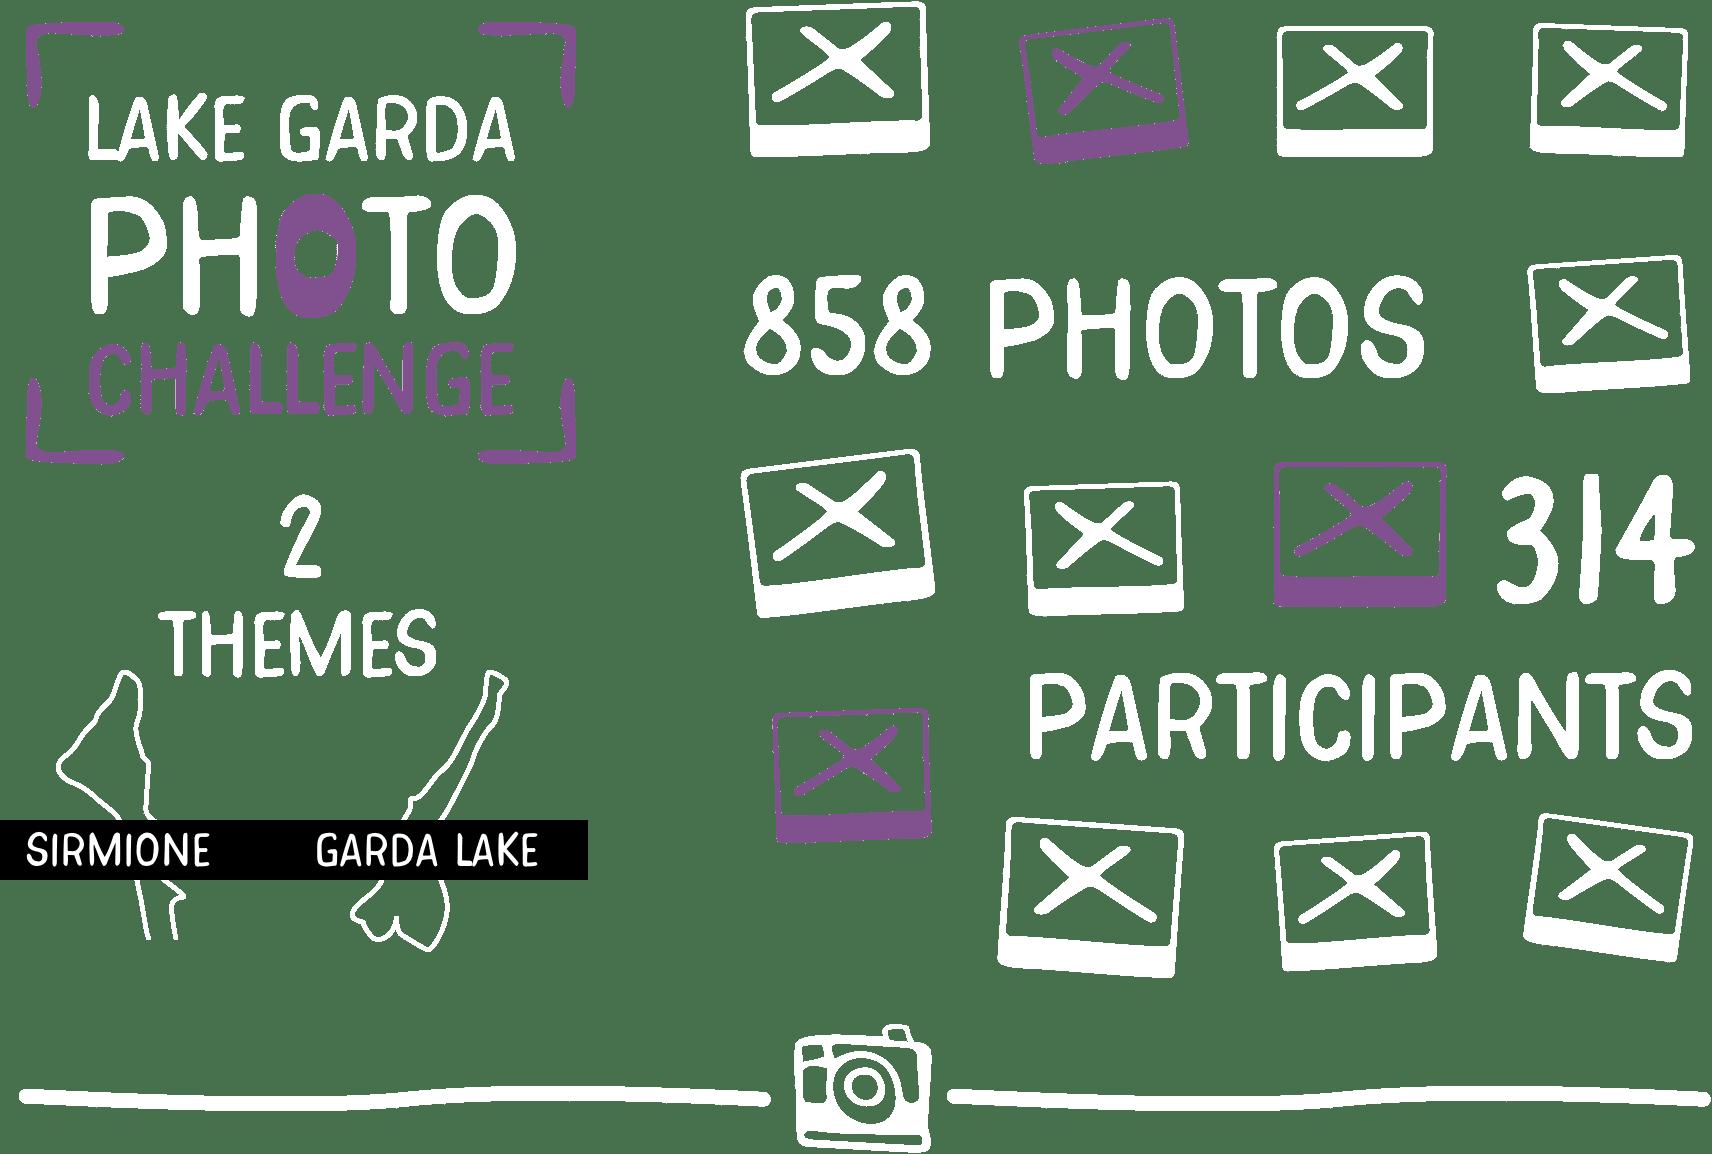 lake garda photo challenge 868 photos + 300 photographers